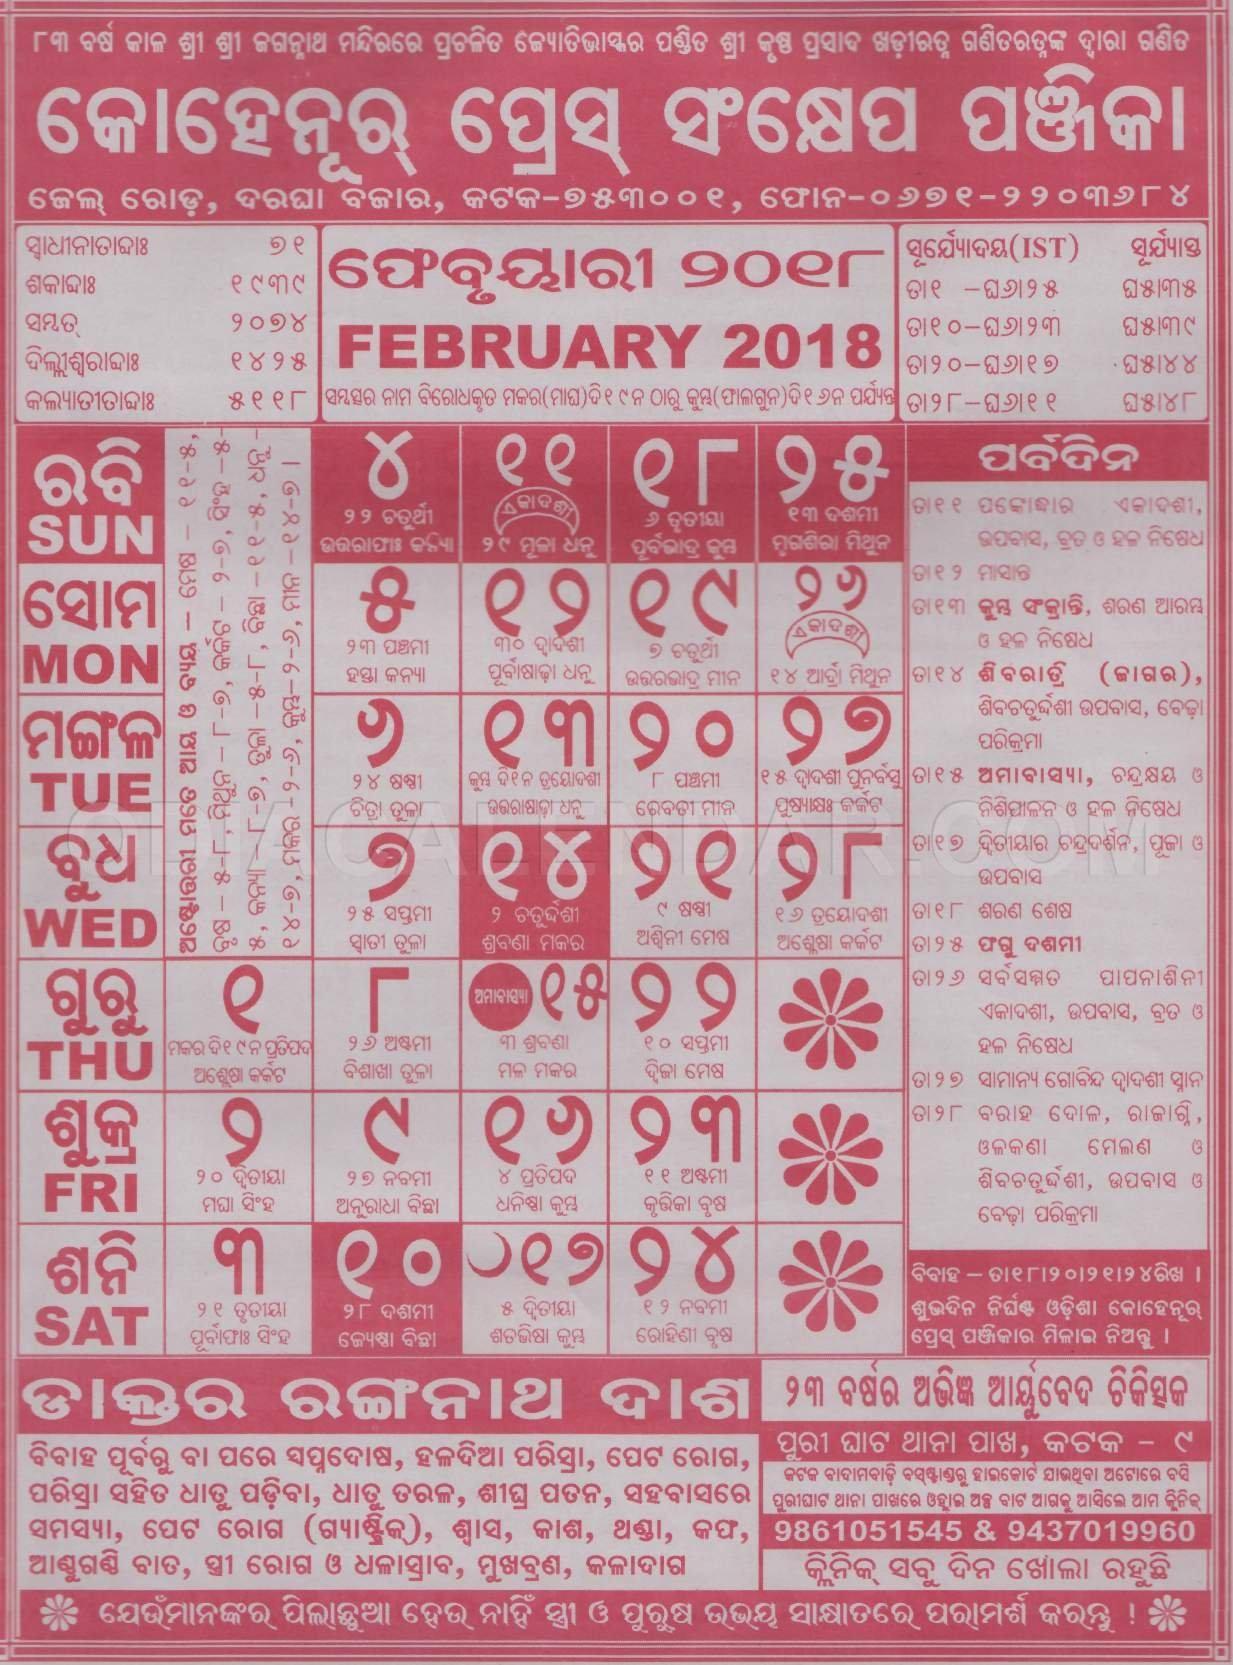 Odia Calendar 2018 | Kohinoor Panjika 201 | Odialive Odia Calendar 2019